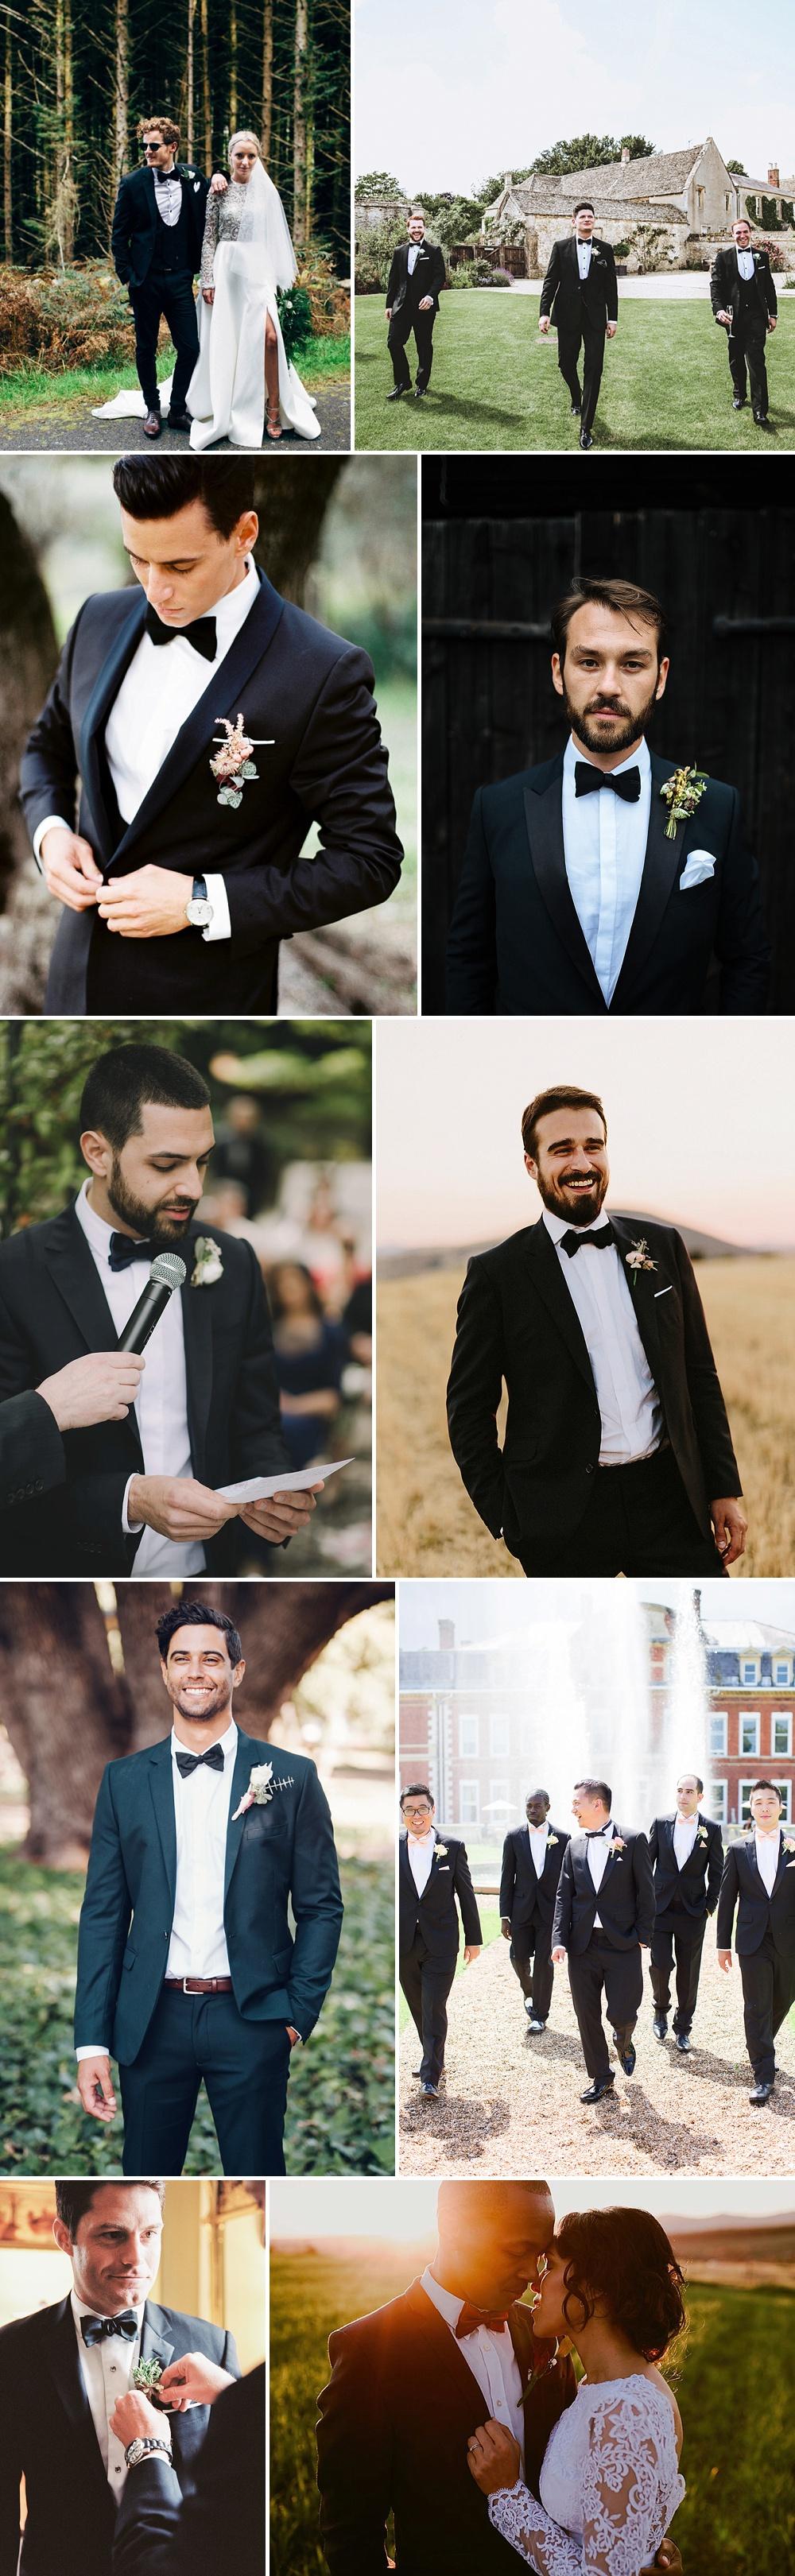 Groom Wearing Black Tie For Wedding | Groom Fashion Inspiration Black Tie